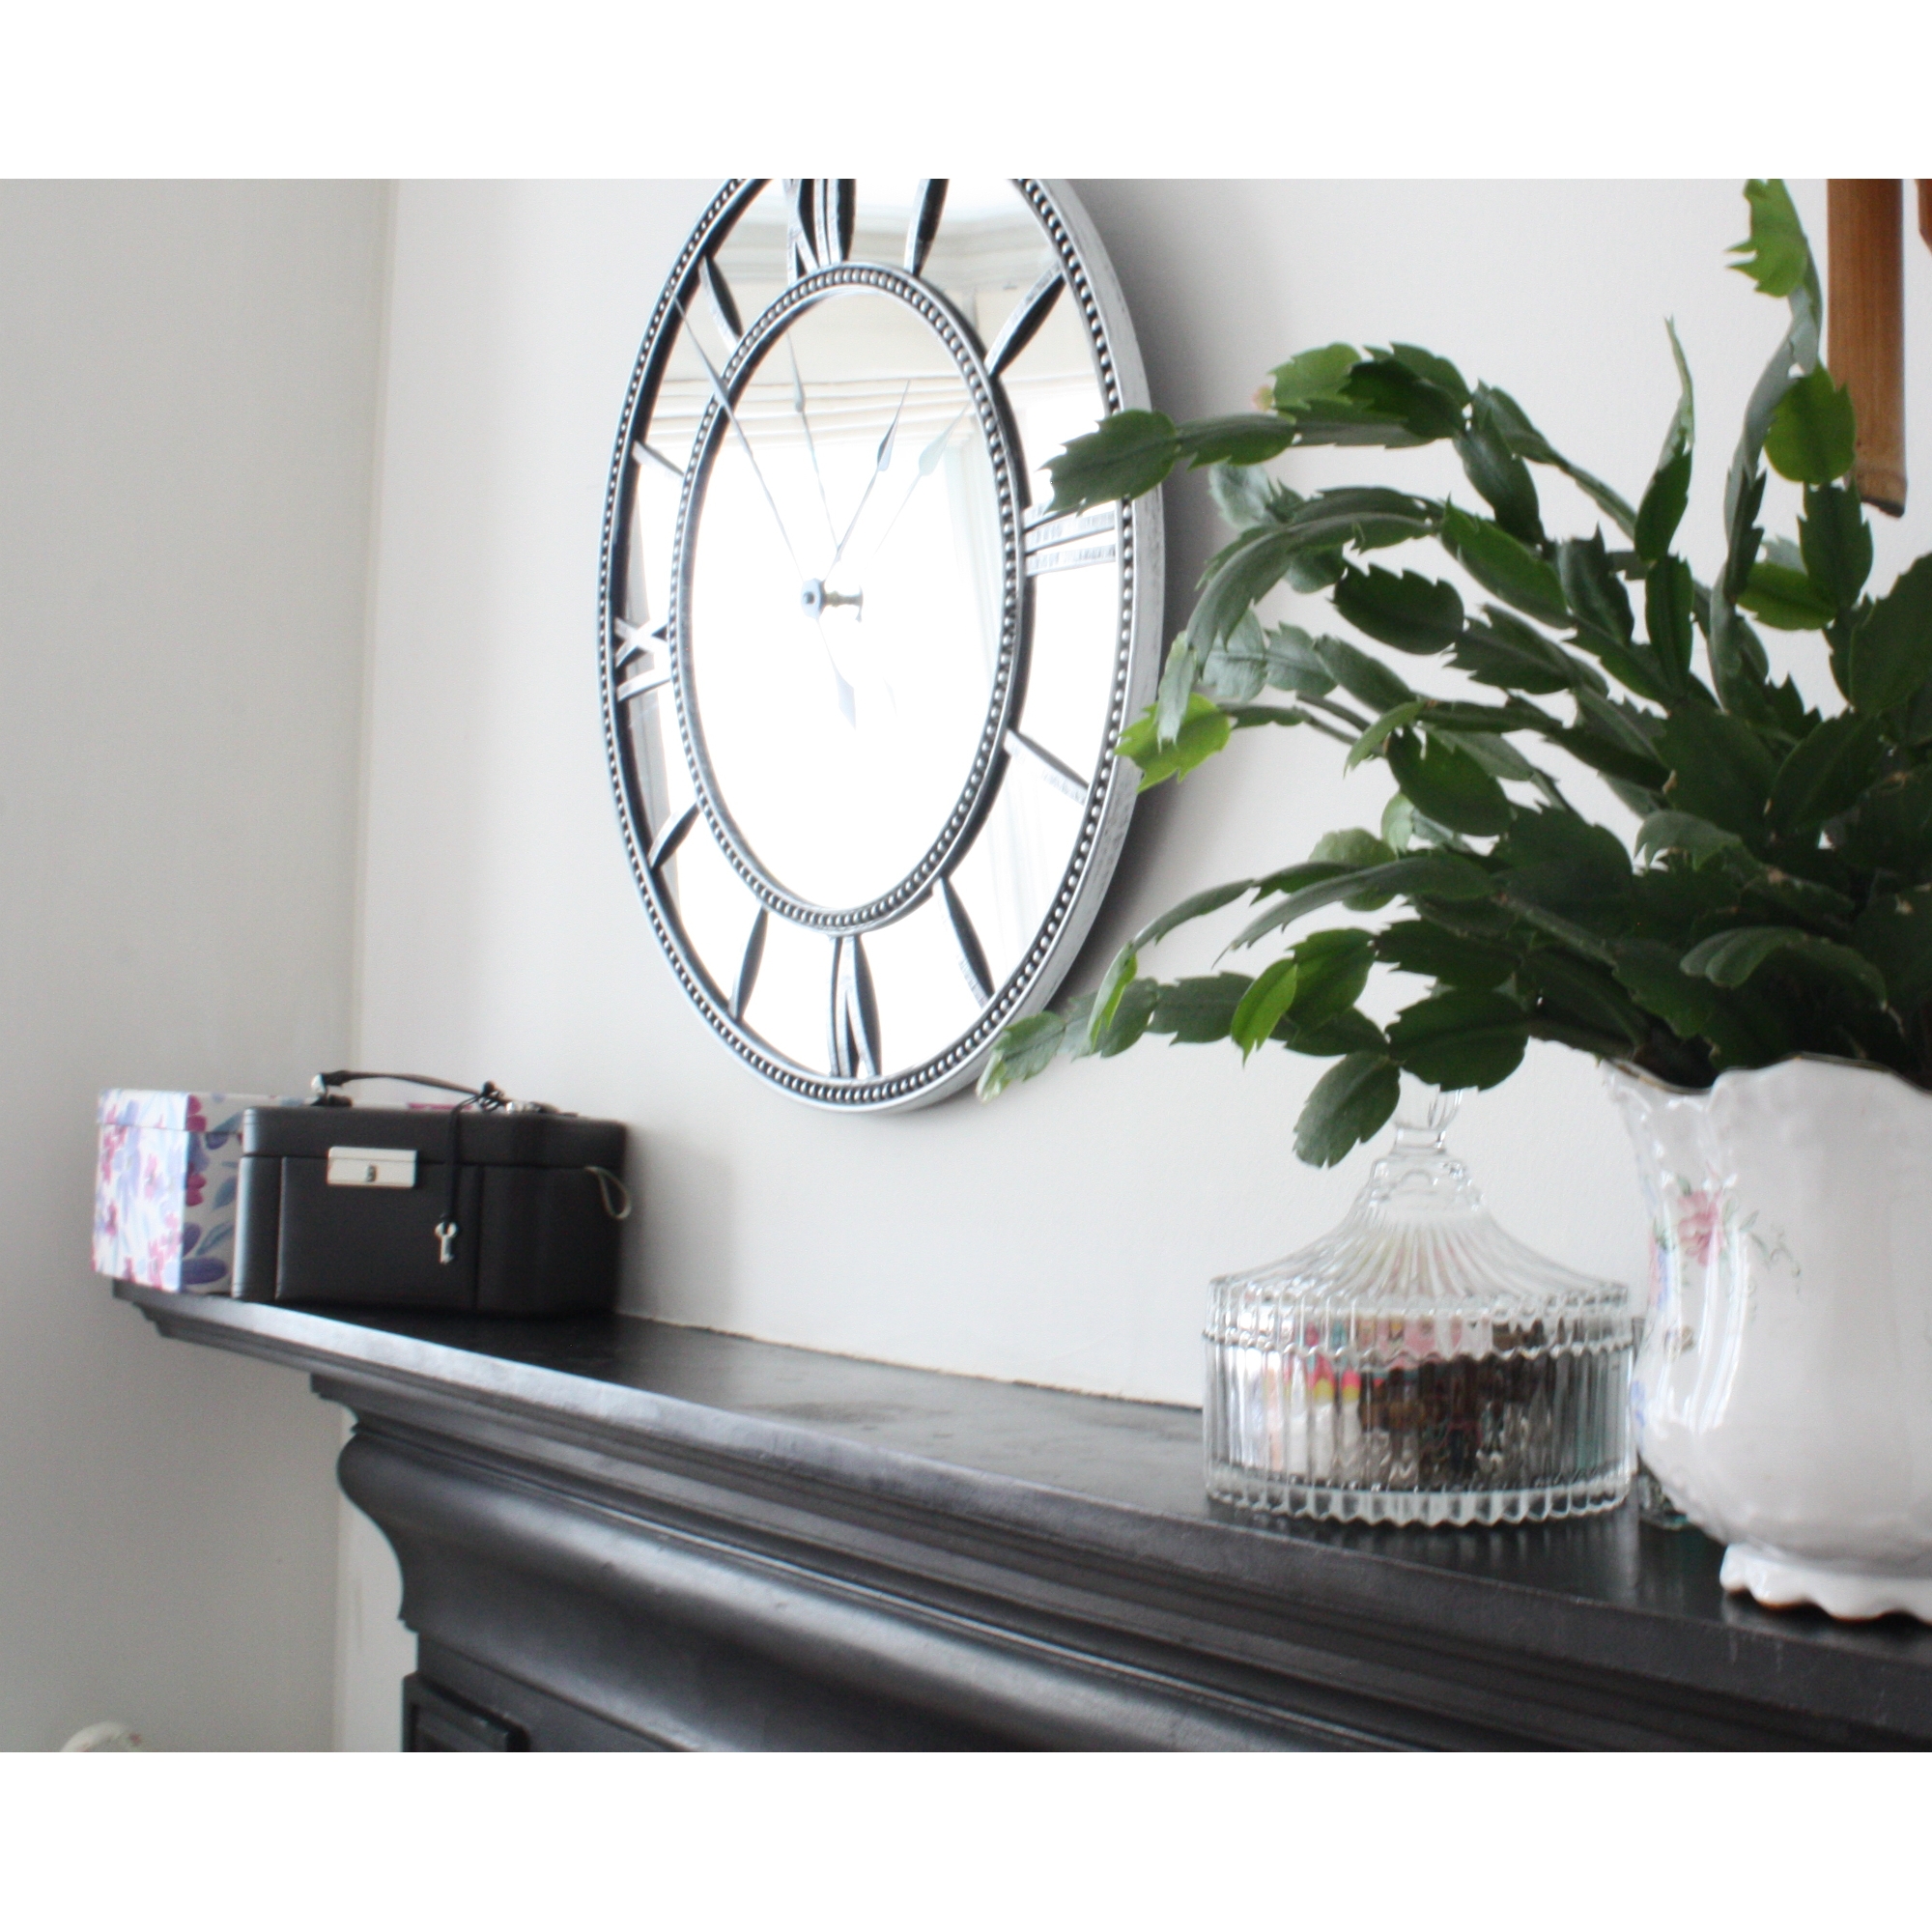 Roman Numeral Mirrored Glass Clock Blendboutique